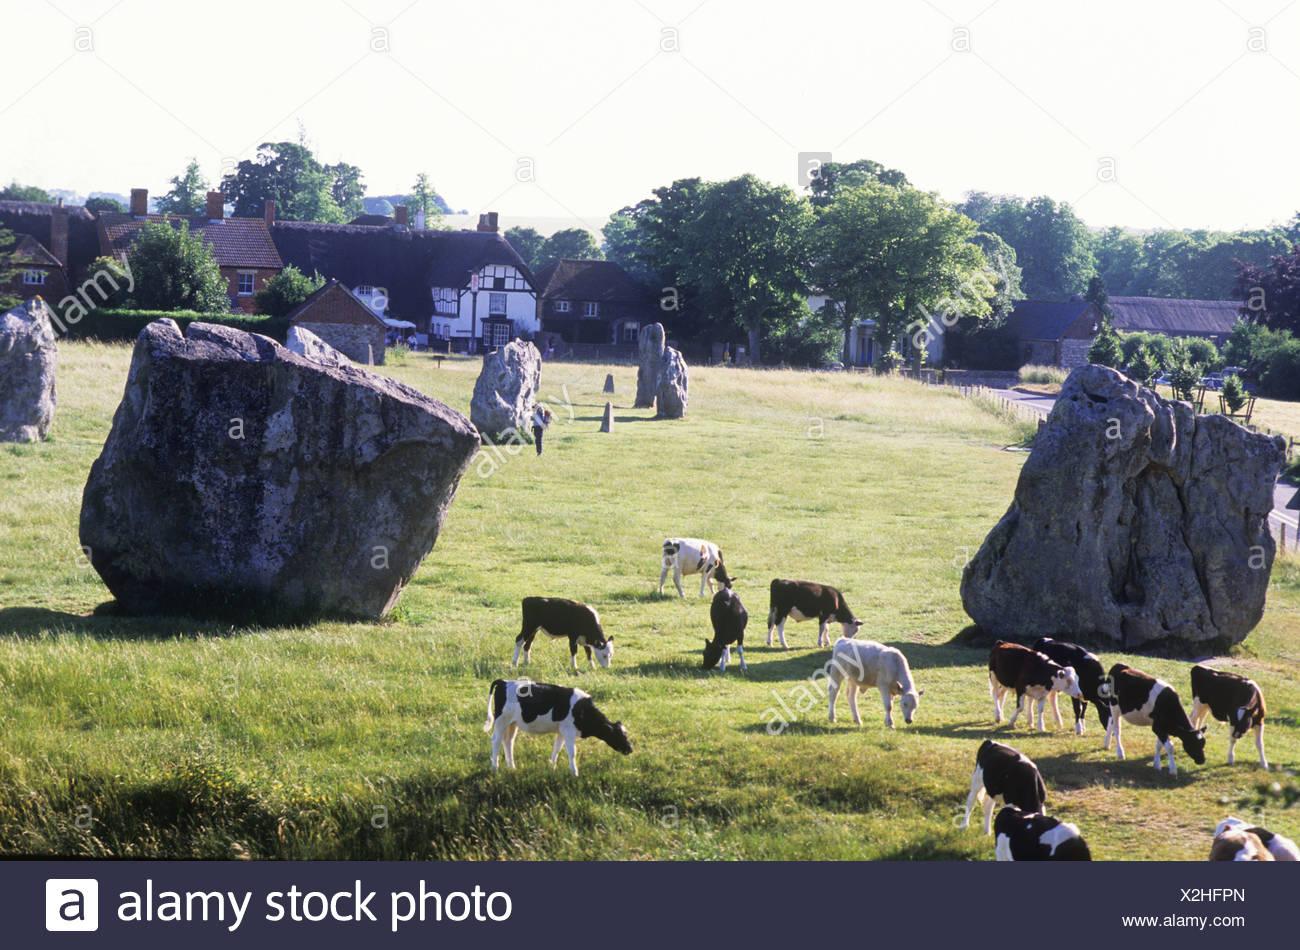 Avebury Wiltshire English prehistoric prehistory stone circle circles England UK sarsen stones religion religious site - Stock Image